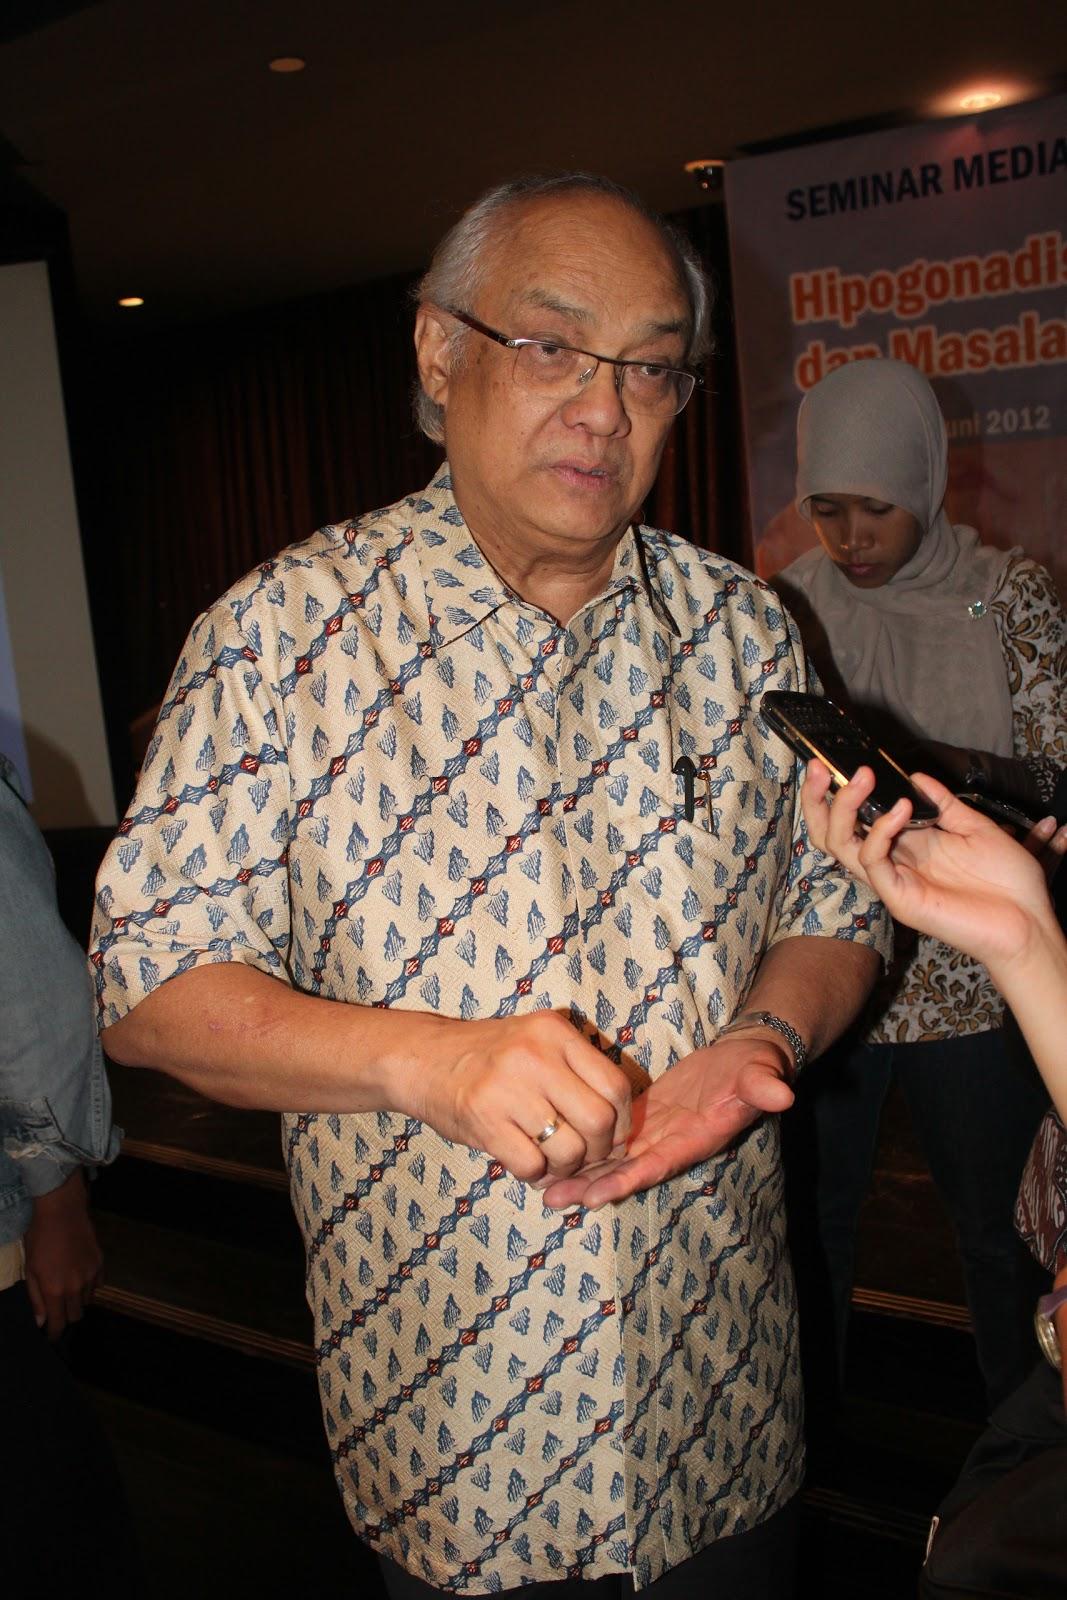 Ruang Periksa Dokter: Prof. Dr. Johan S Mansjhur, SpPD KEMD